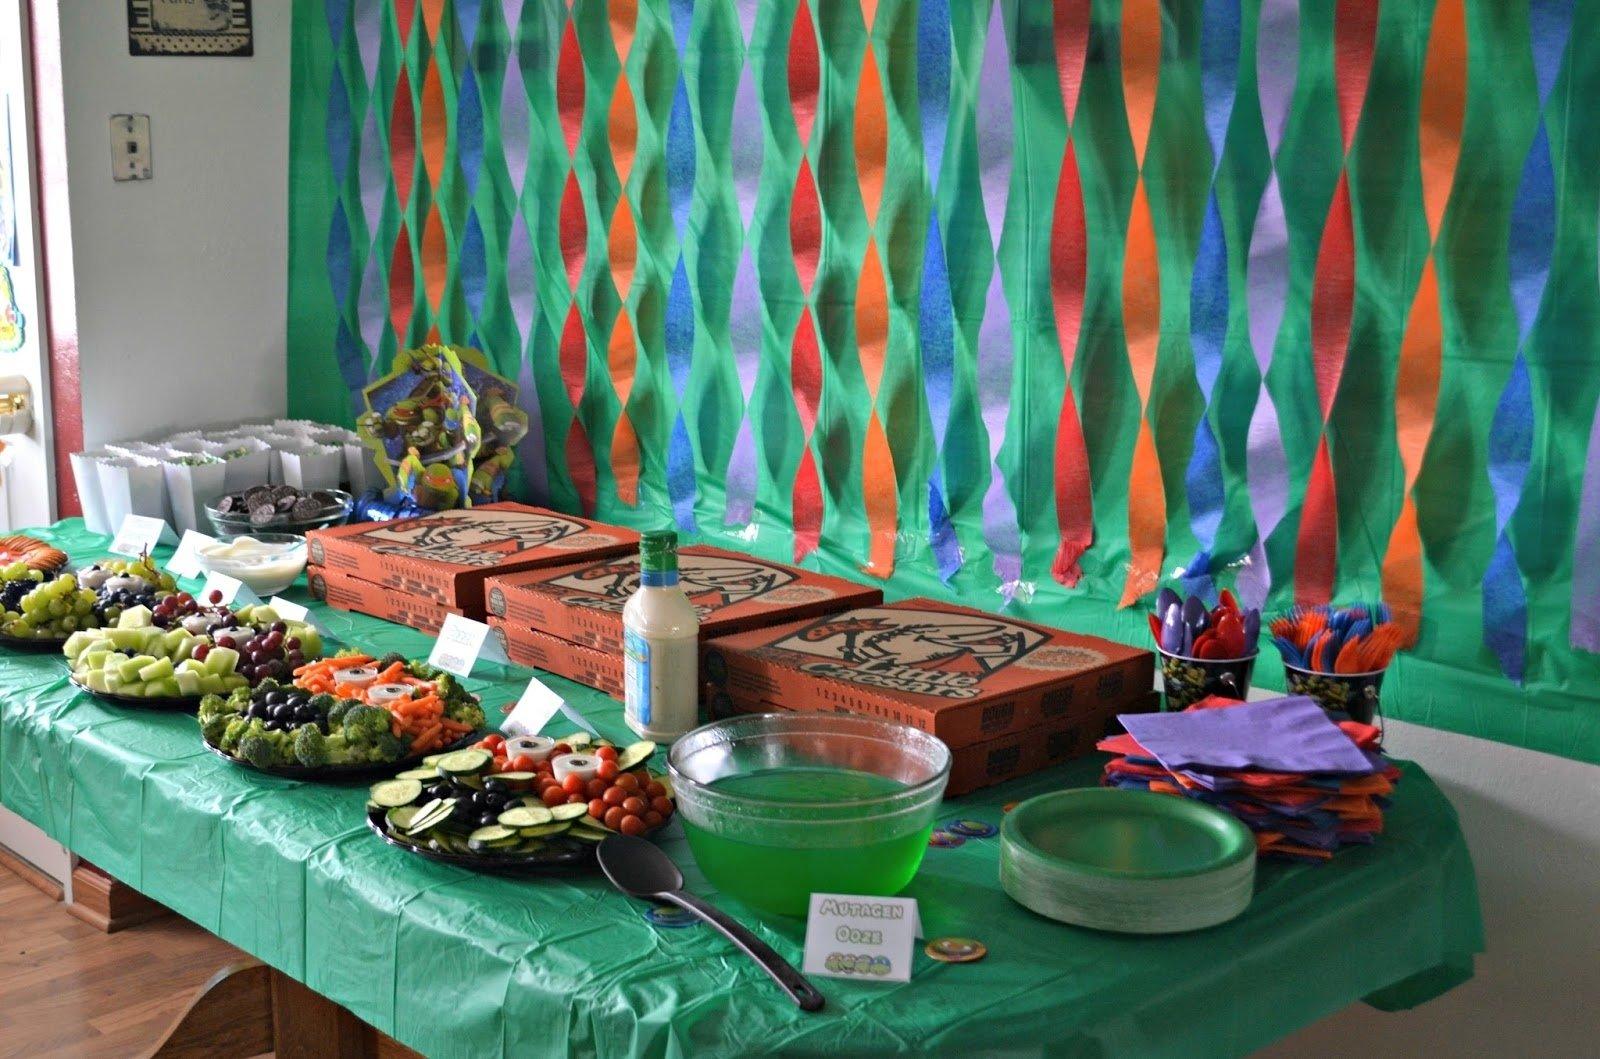 10 Fantastic Ninja Turtles Birthday Party Ideas shocking teenage mutant ninja turtle birthday party building our 3 2020